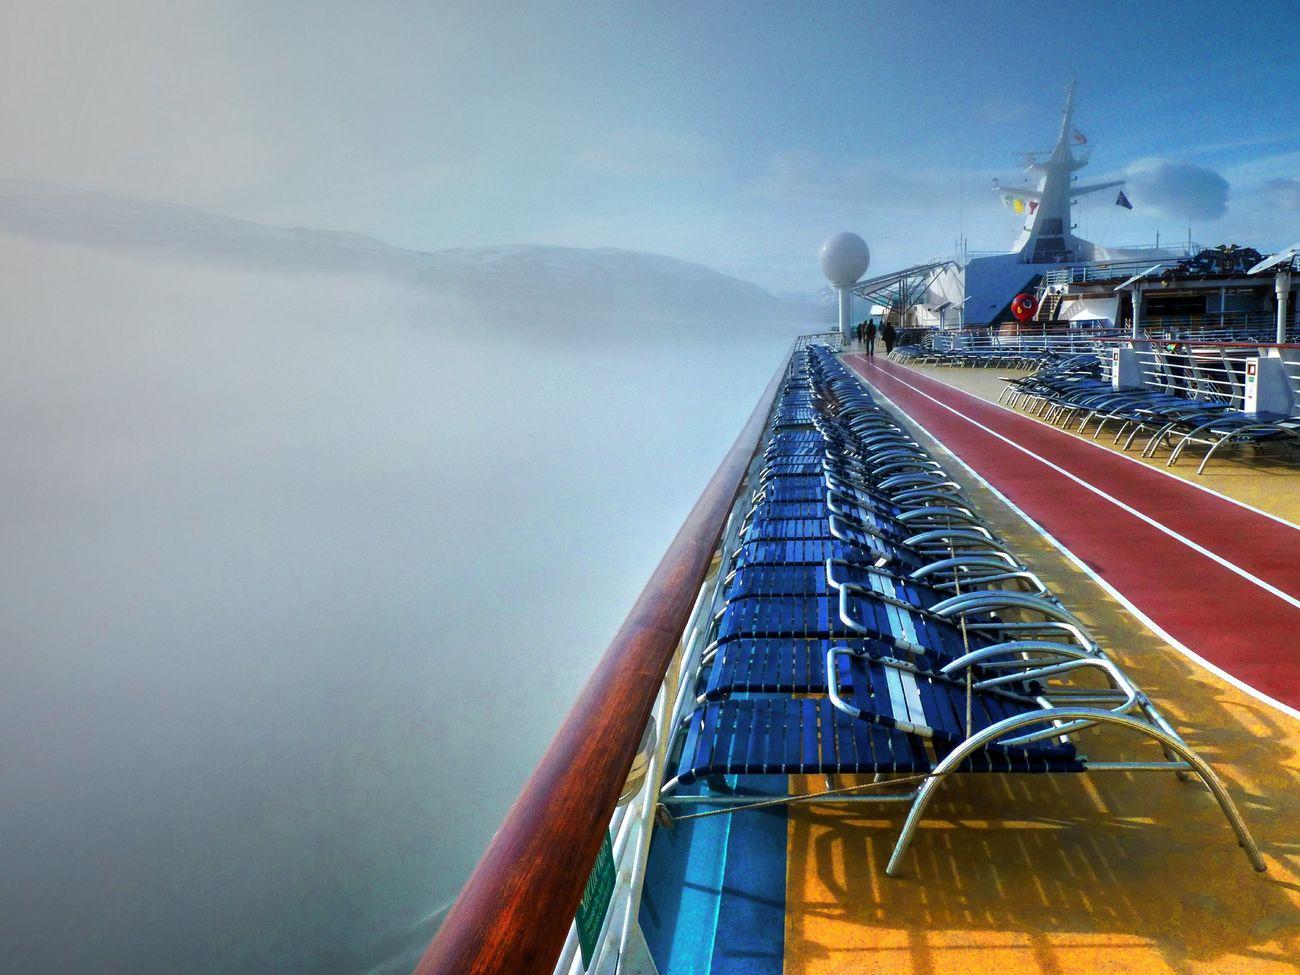 Akureyri Adventure Of The Seas Misty